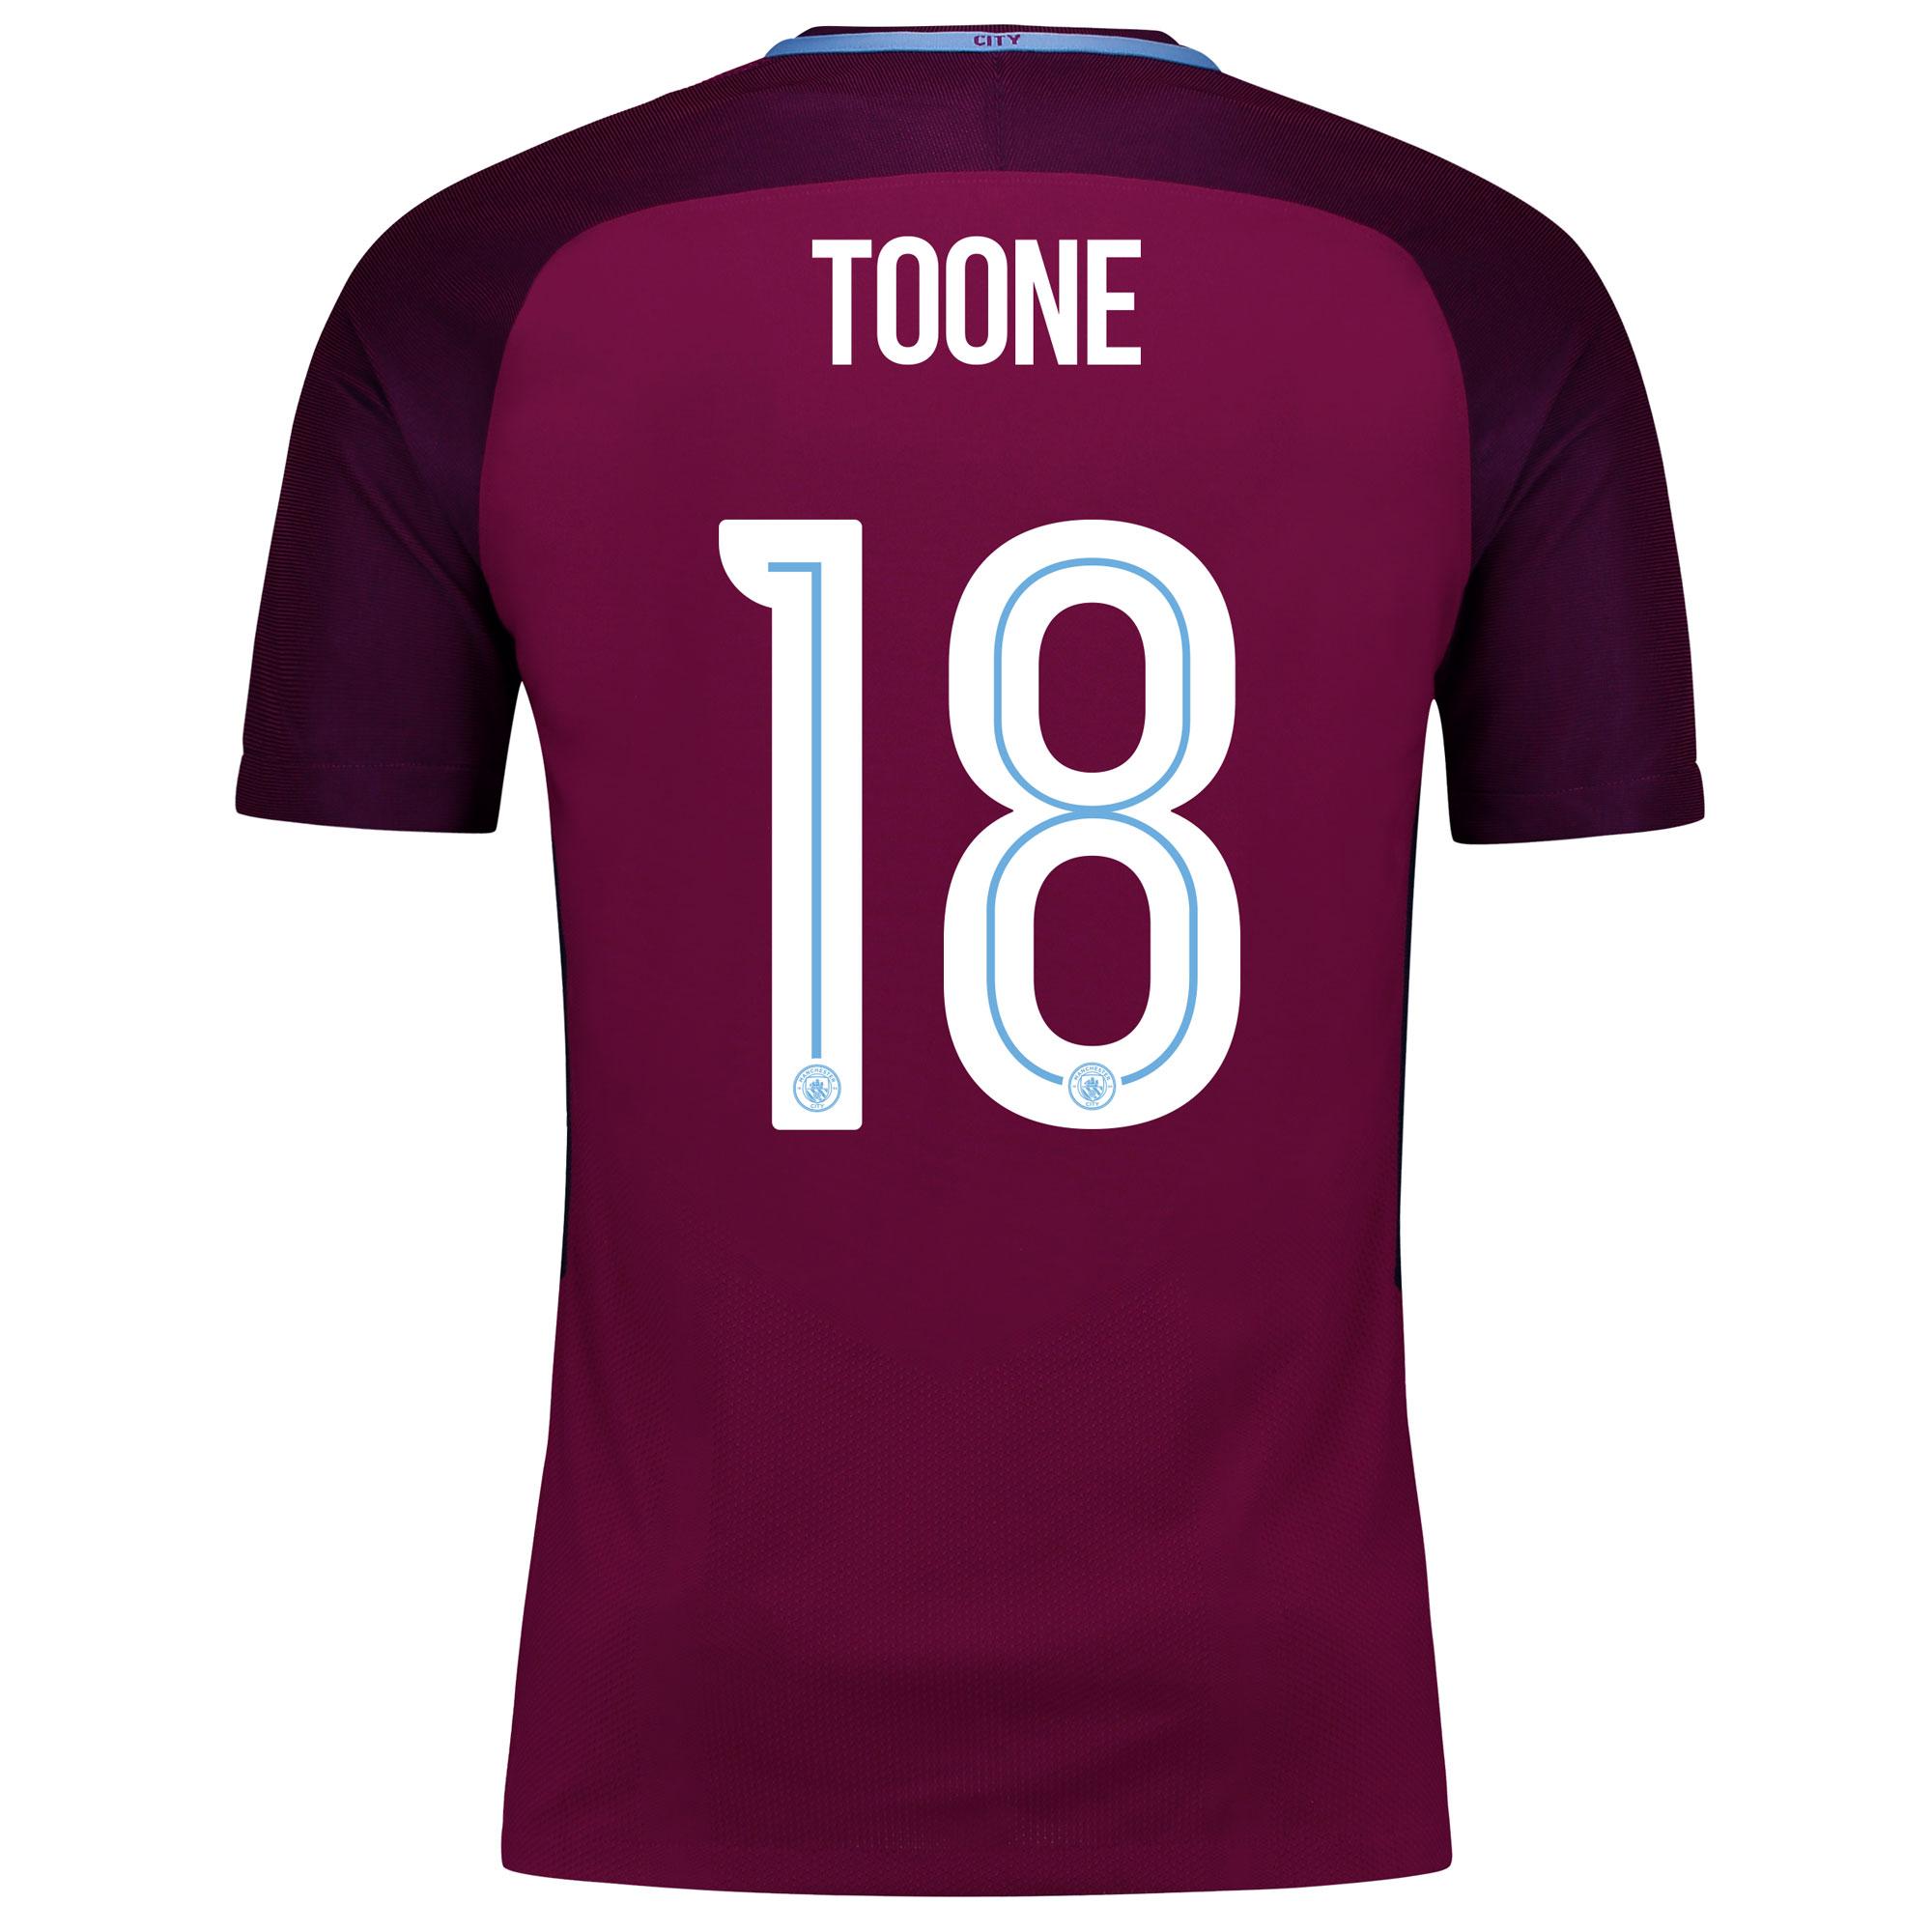 Manchester City Away Vapor Match Cup Shirt 2017-18 with Toone 18 print